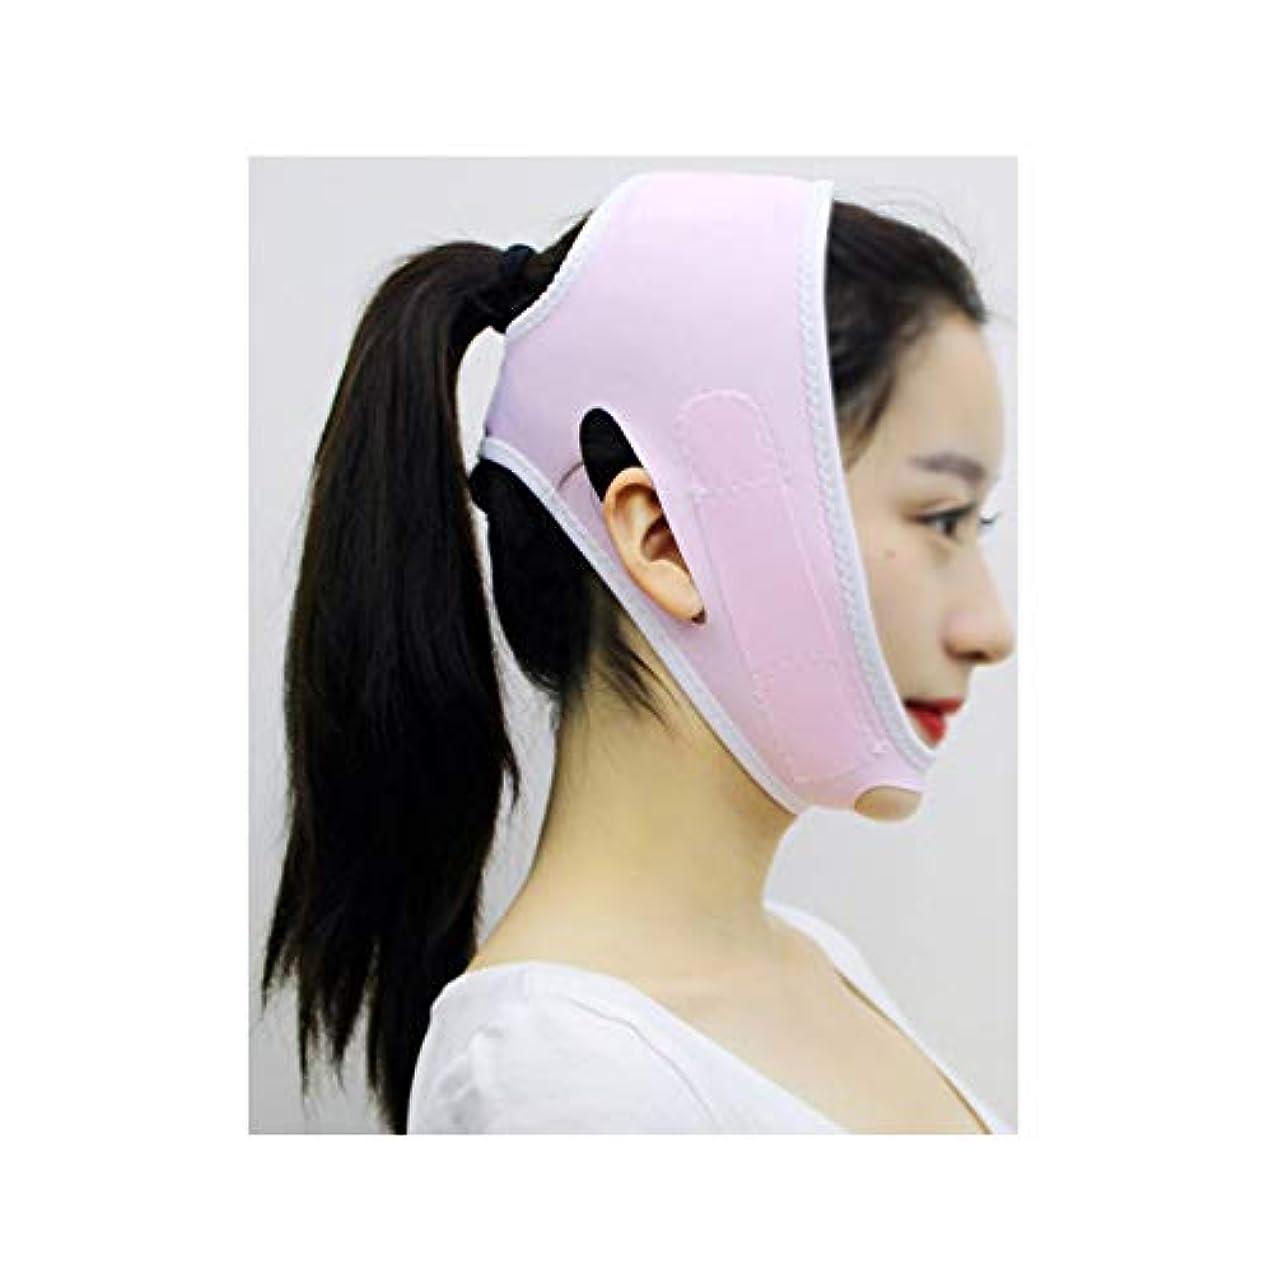 GLJJQMY 包帯ヘッドギアマスクの顔Vの顔の薄い顔のアーティファクトプラスチック美容ゴムバンドフェイスリフトネックリフト後薄い顔マスクあごベルトの回復 顔用整形マスク (Color : Pink)